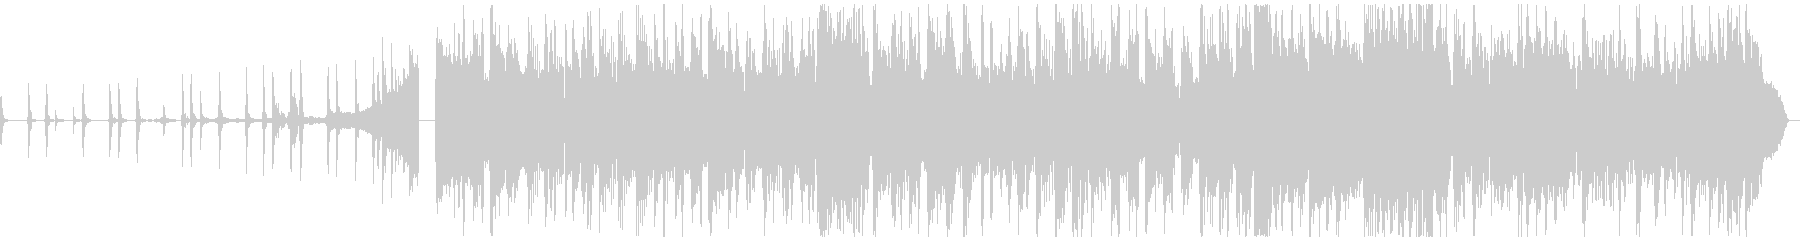 CM用!30秒で完結するポストロック曲の未再生の波形